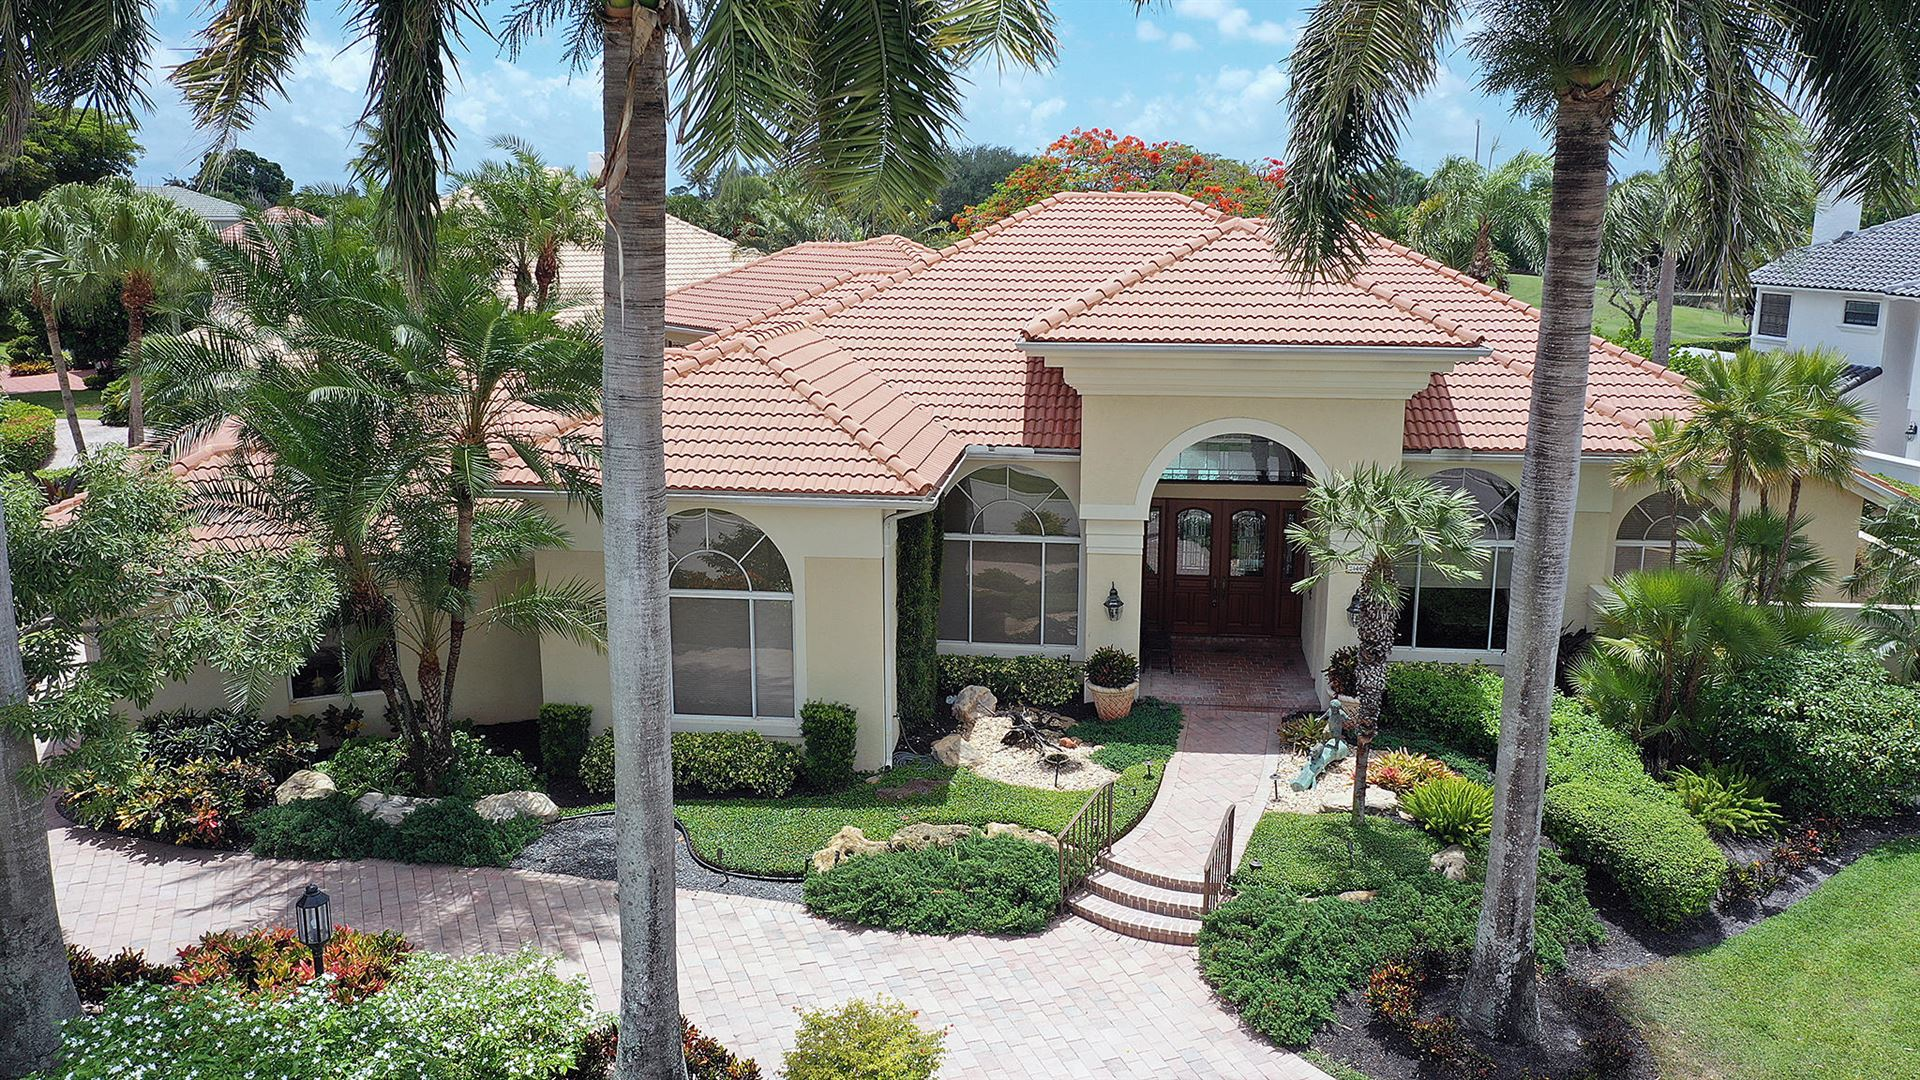 21440 Burnside Court, Boca Raton, FL 33433 - MLS#: RX-10725961